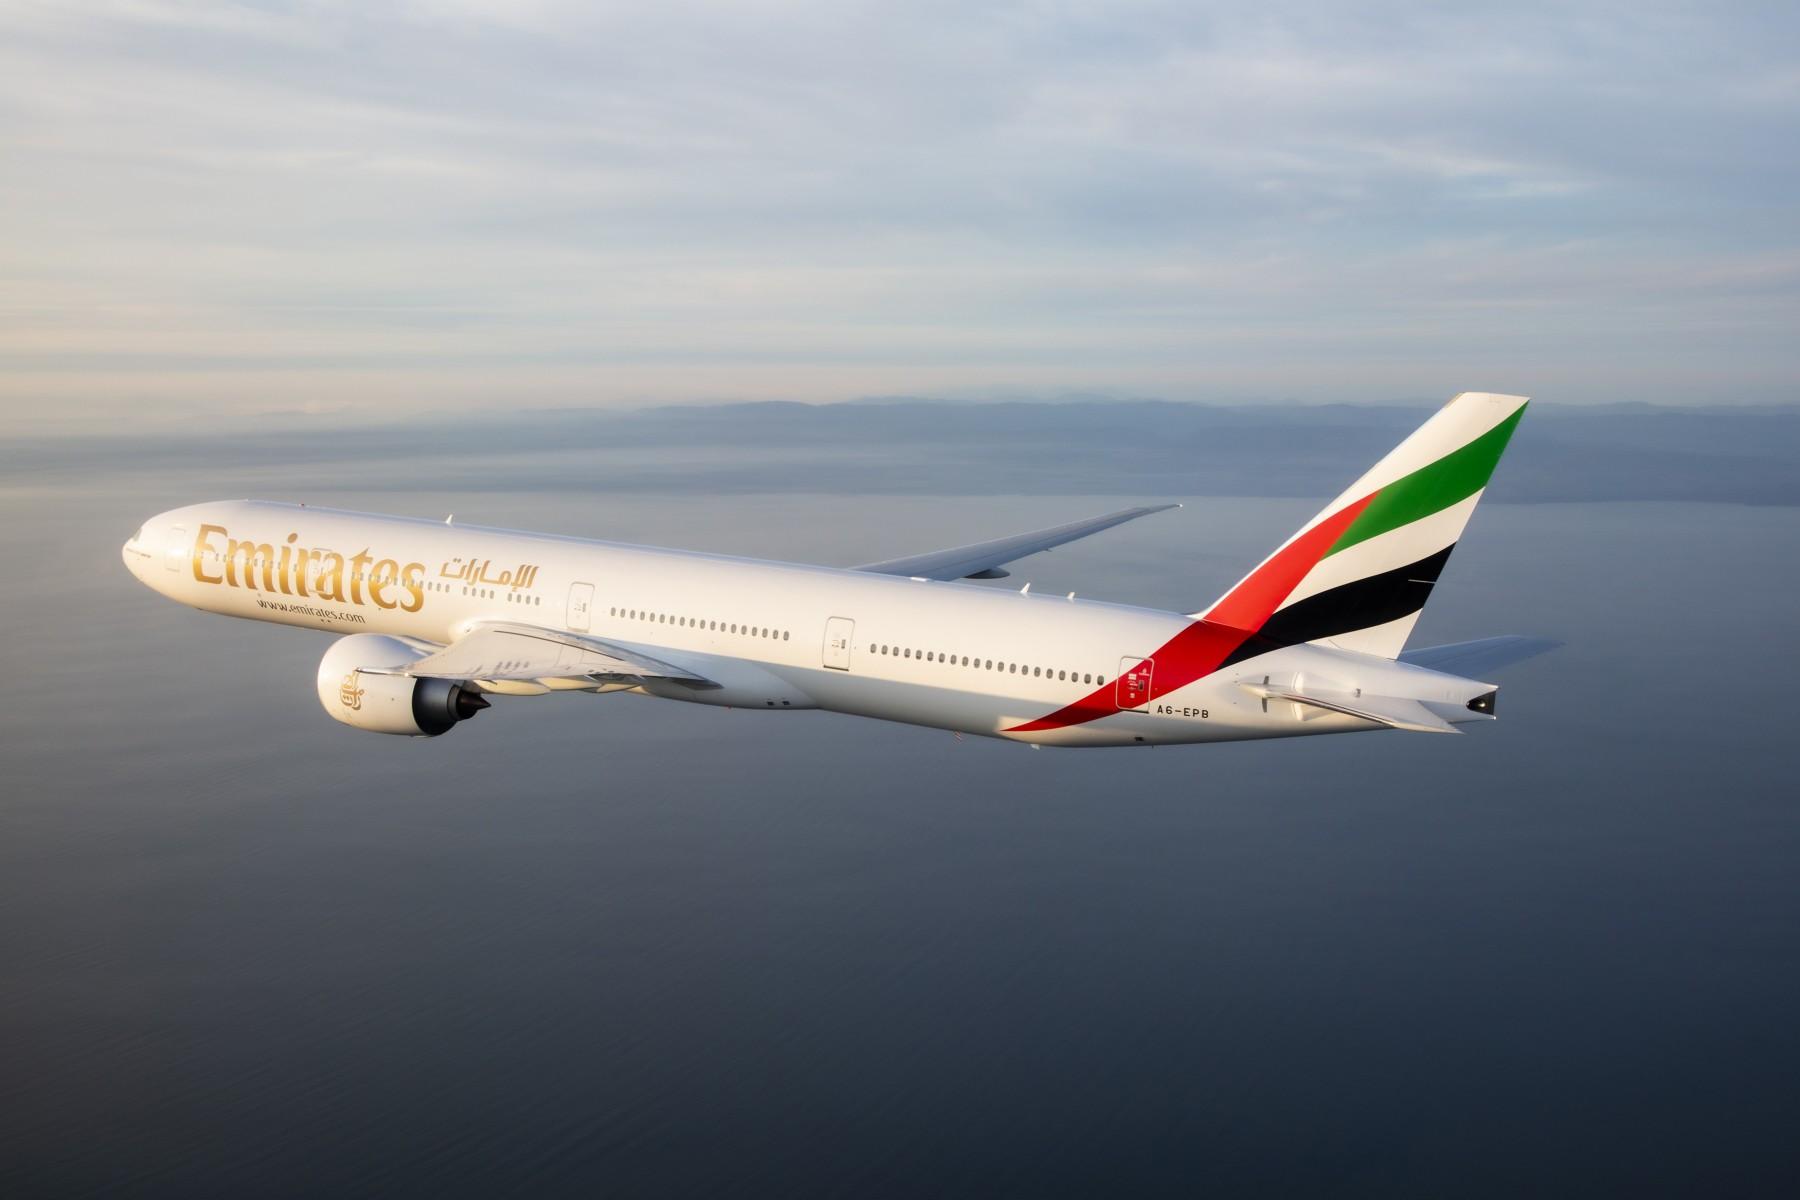 SkyCargo امارات برای پروازهای جشنواره Onam از preighters B777 استفاده می کند